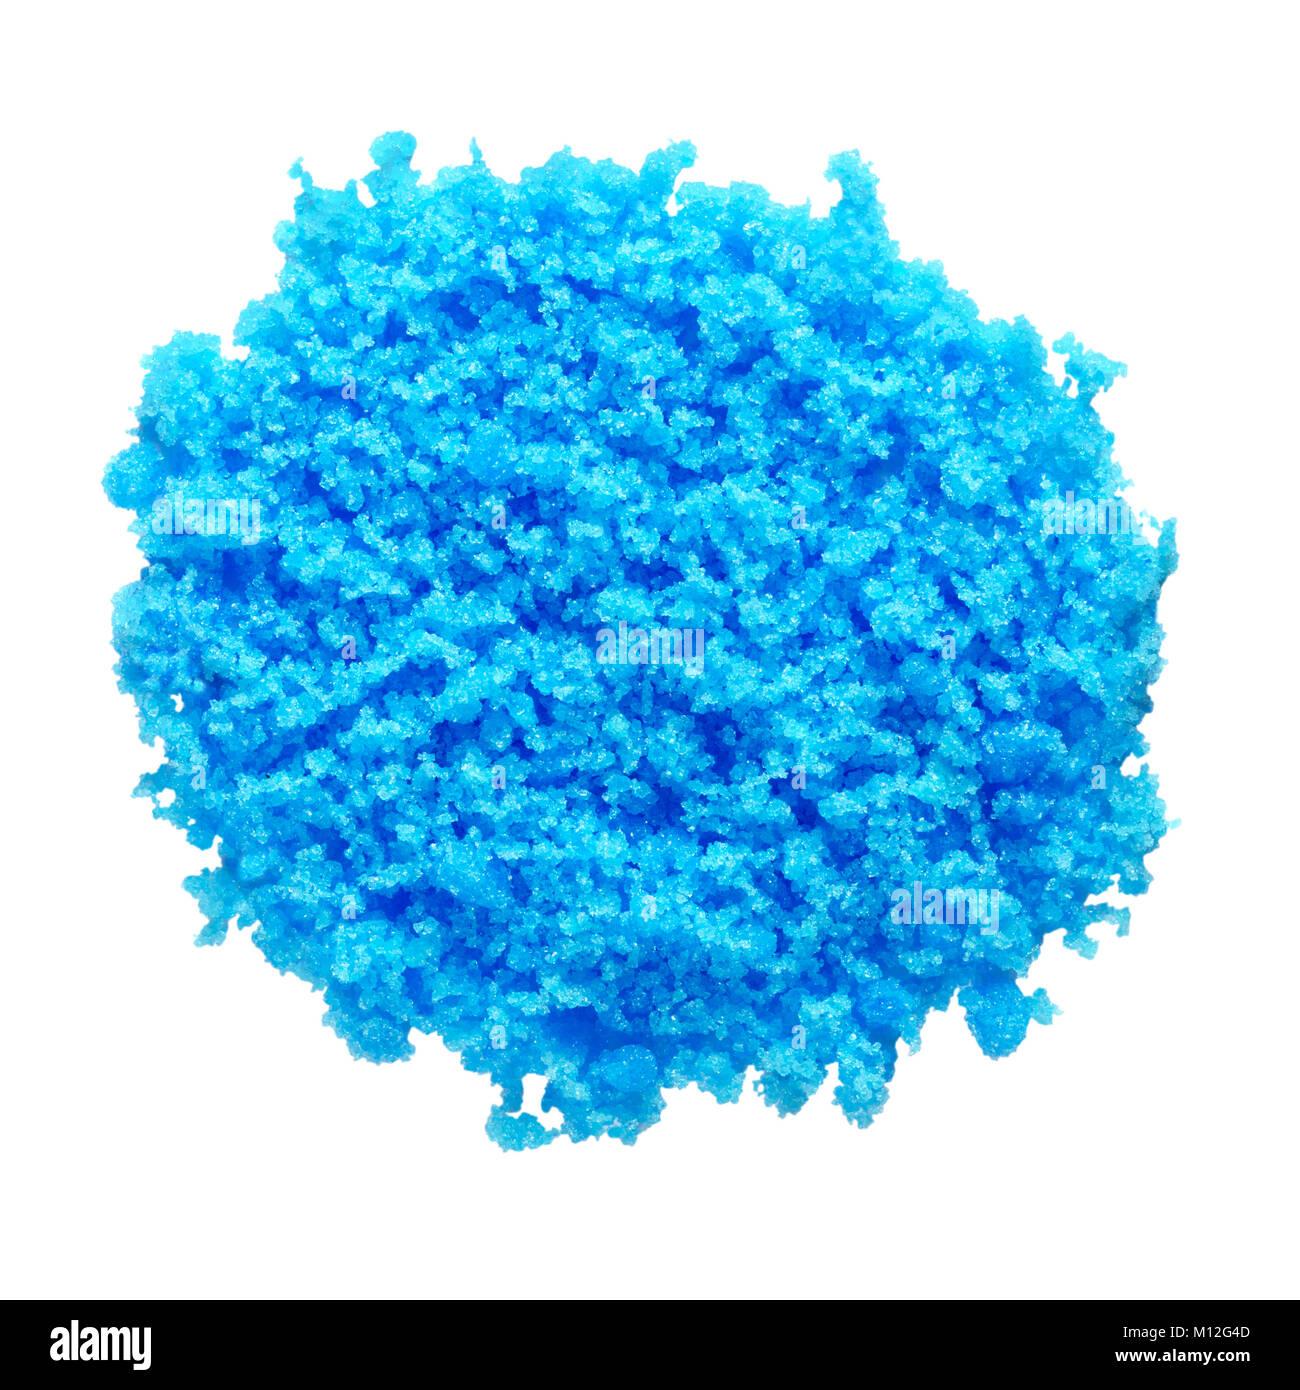 Cupric sulfate isolated on white. Bright, blue copper sulfate, CuSO4, also called blue vitriol or bluestone. Salt. - Stock Image